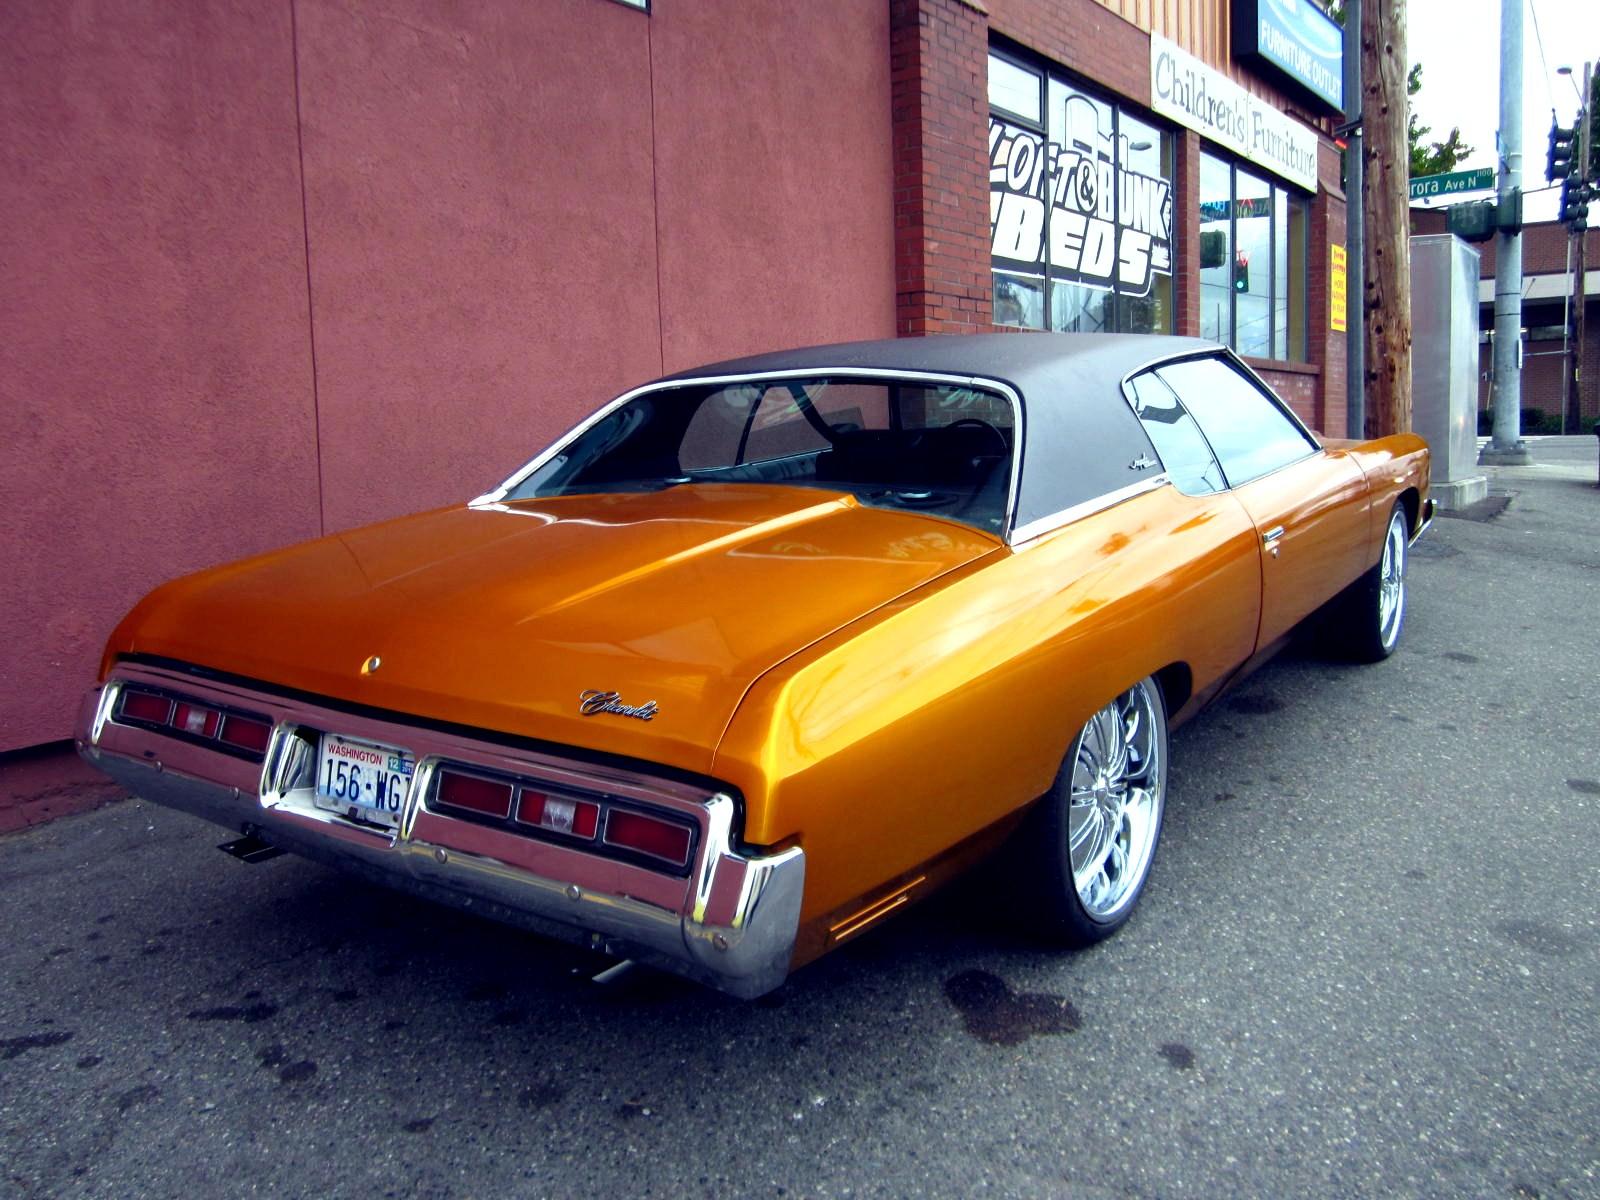 Seattle39;s Classics: 1972 Chevrolet Caprice Classic